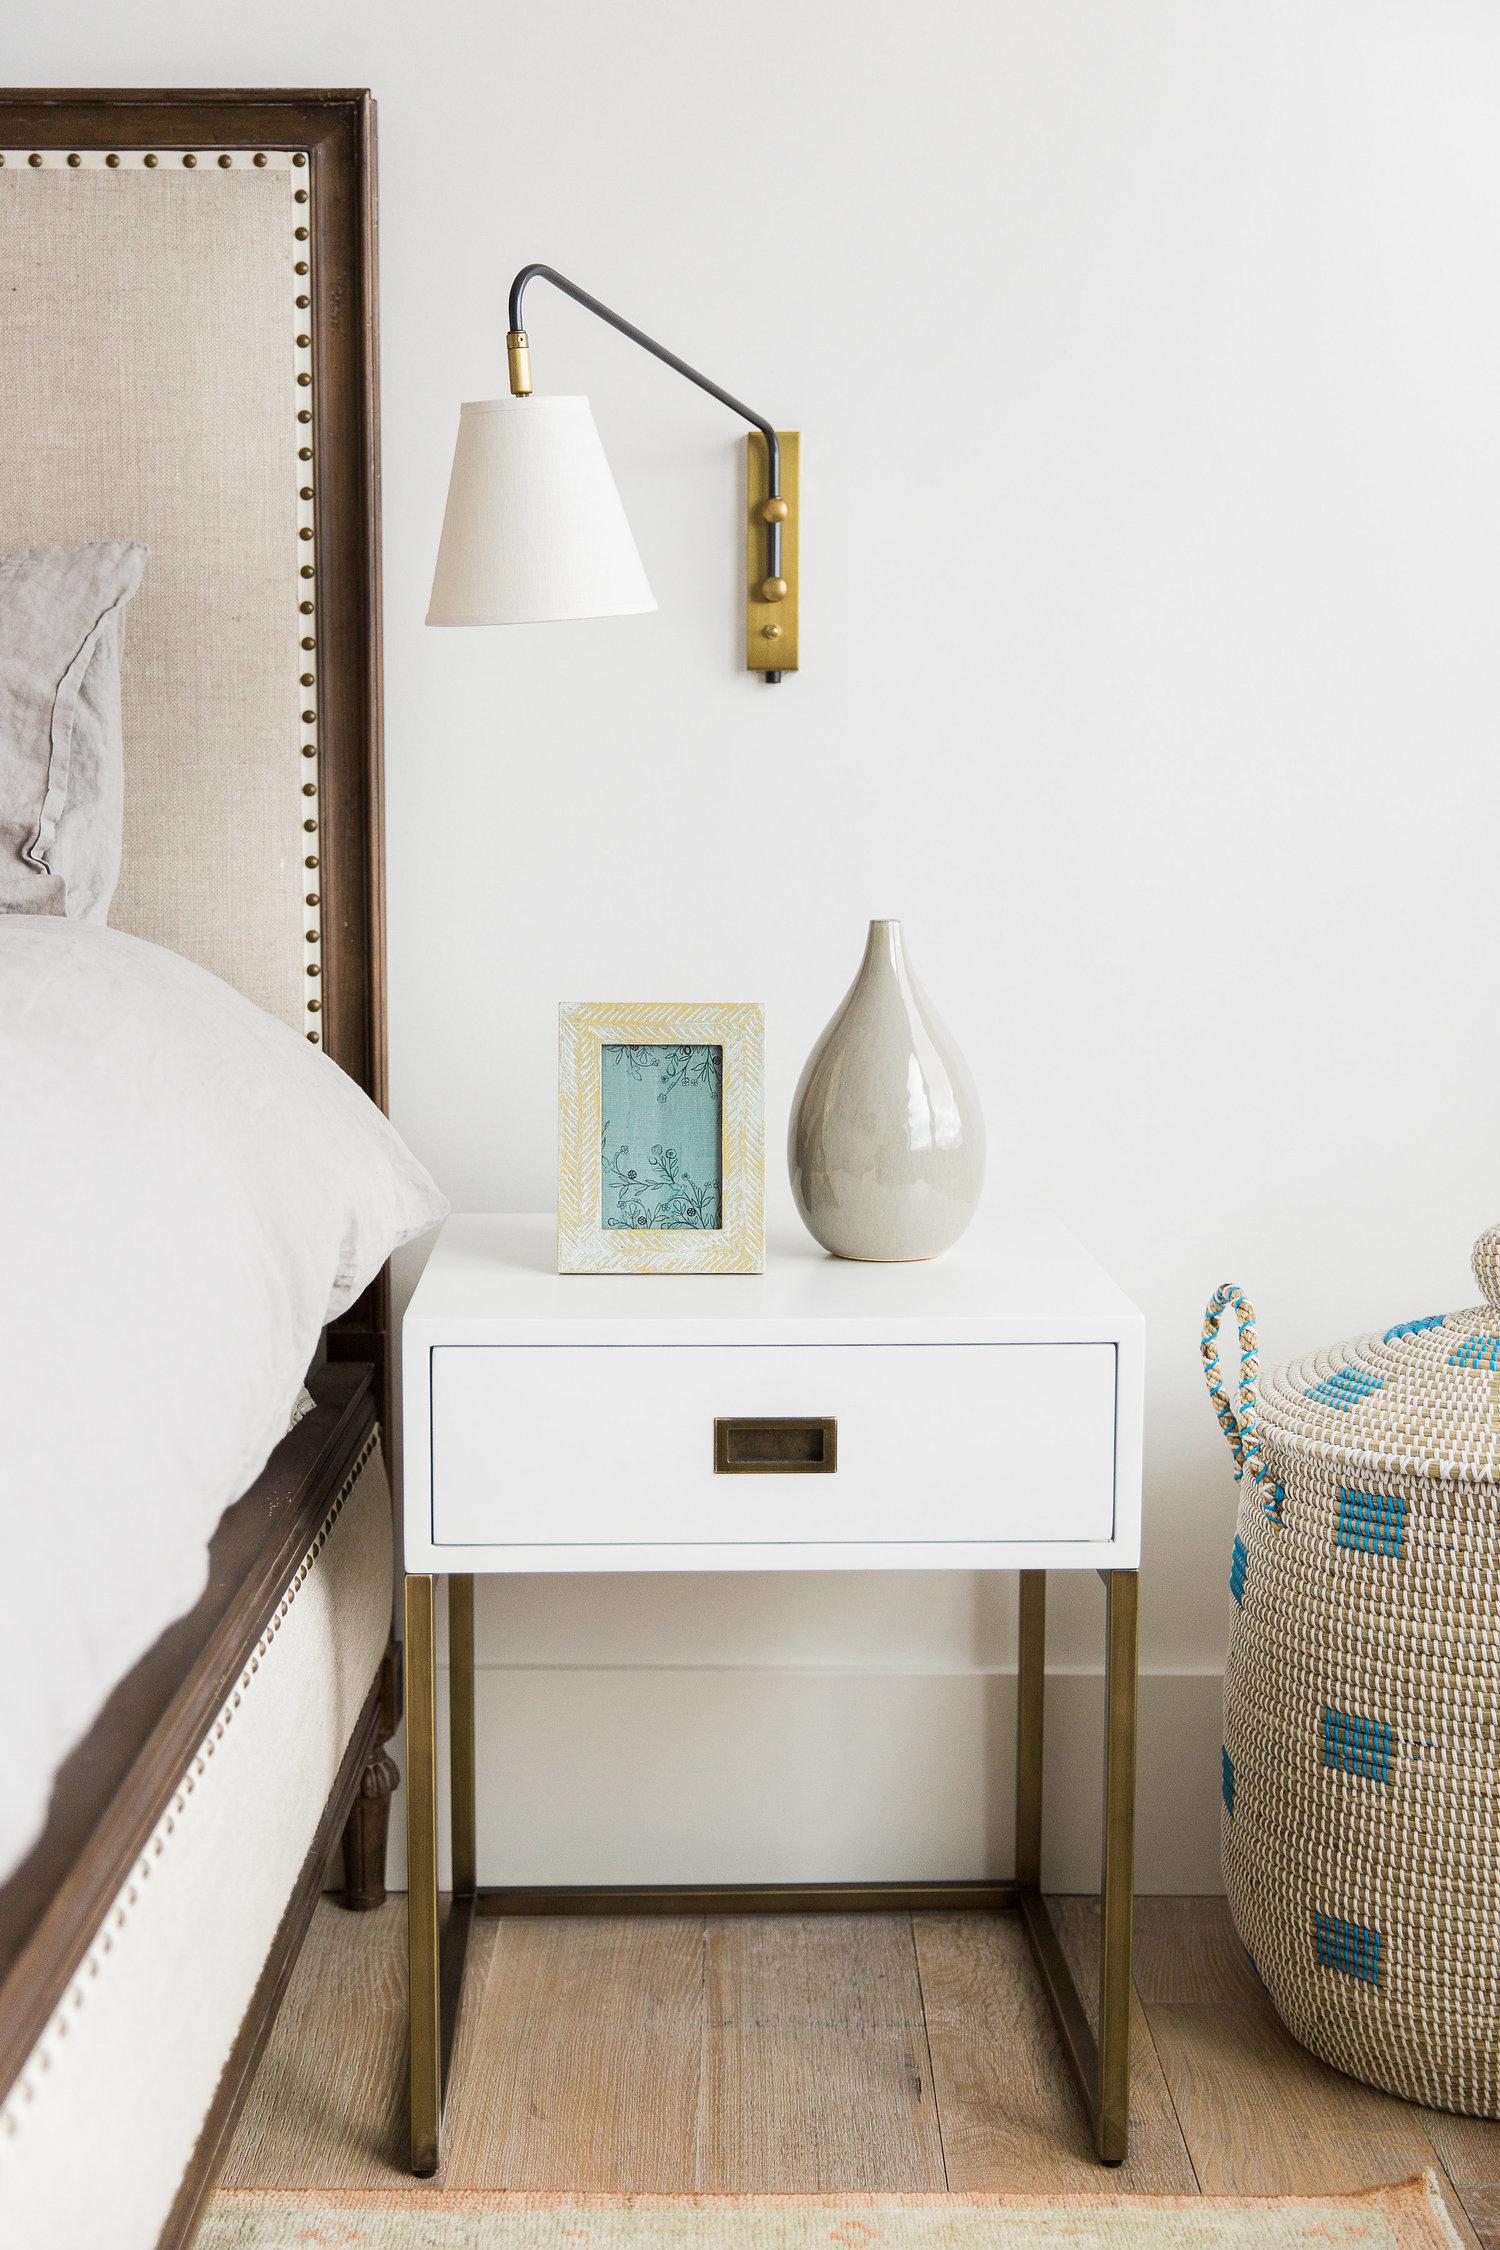 White nightstand beneath mounted lamp